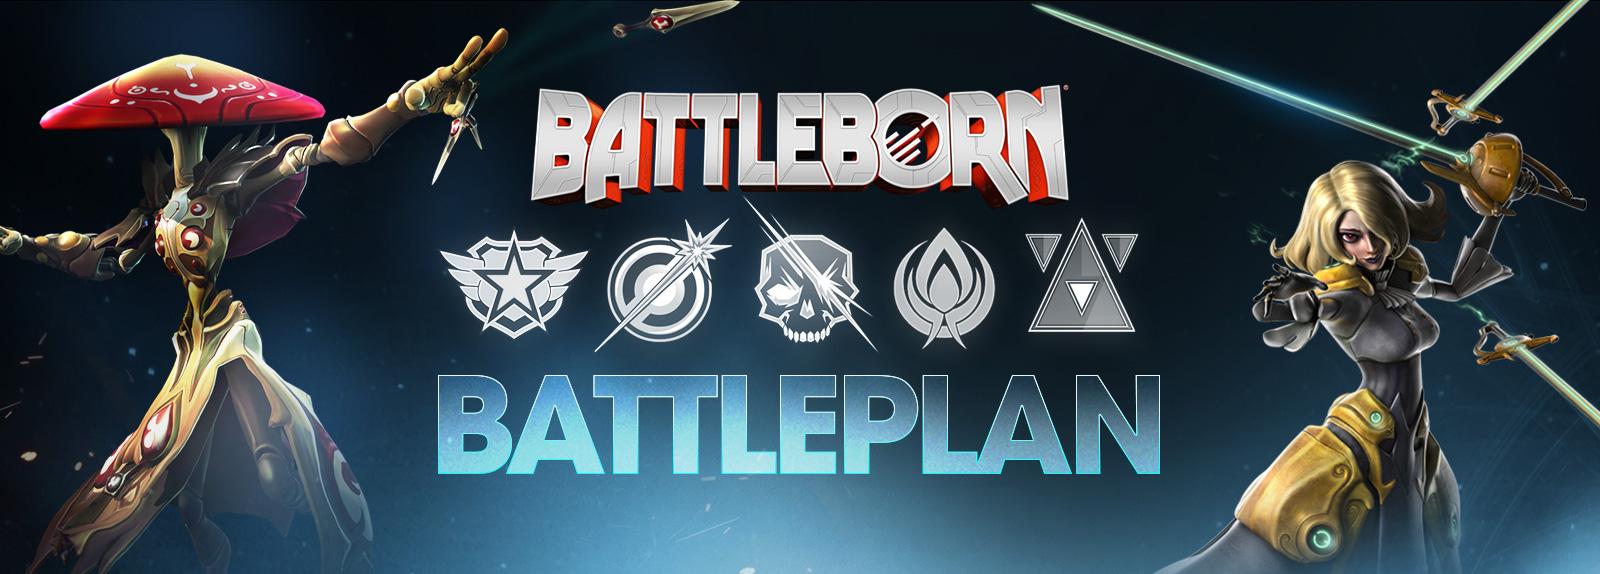 [Image: BattleplanHeader_2.jpg]